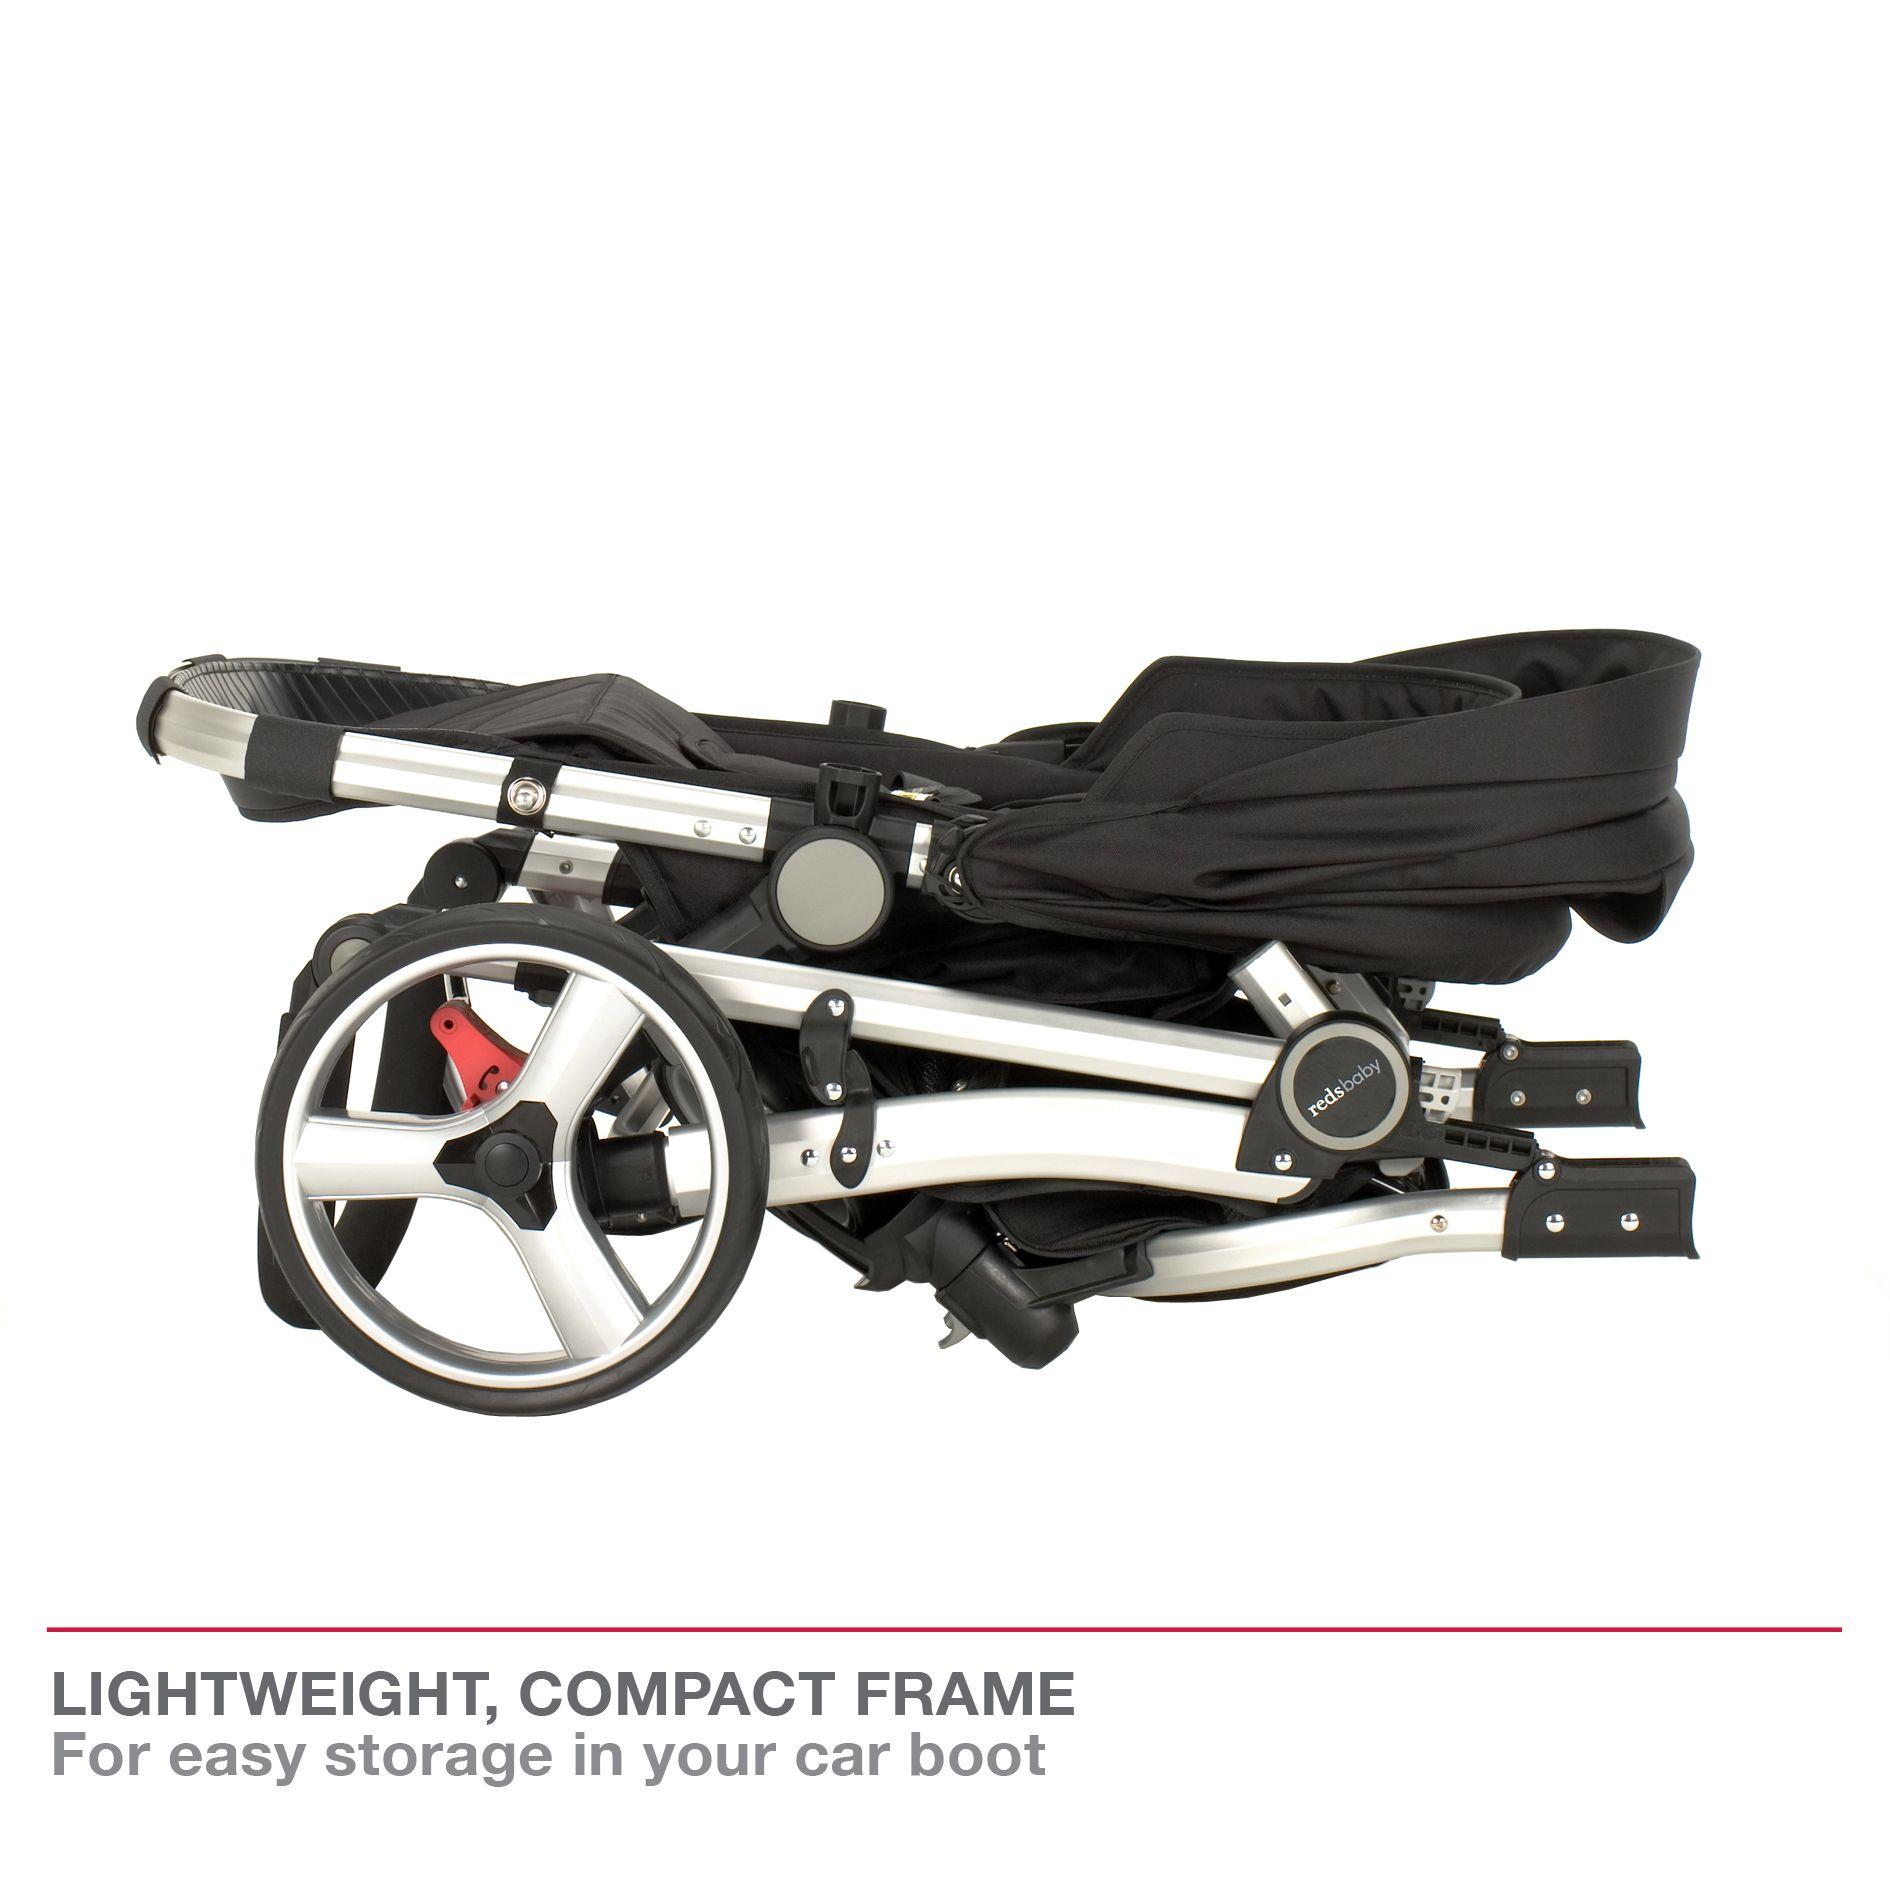 Redsbaby Bounce The Ultimate AllInOne Stroller/ Pram